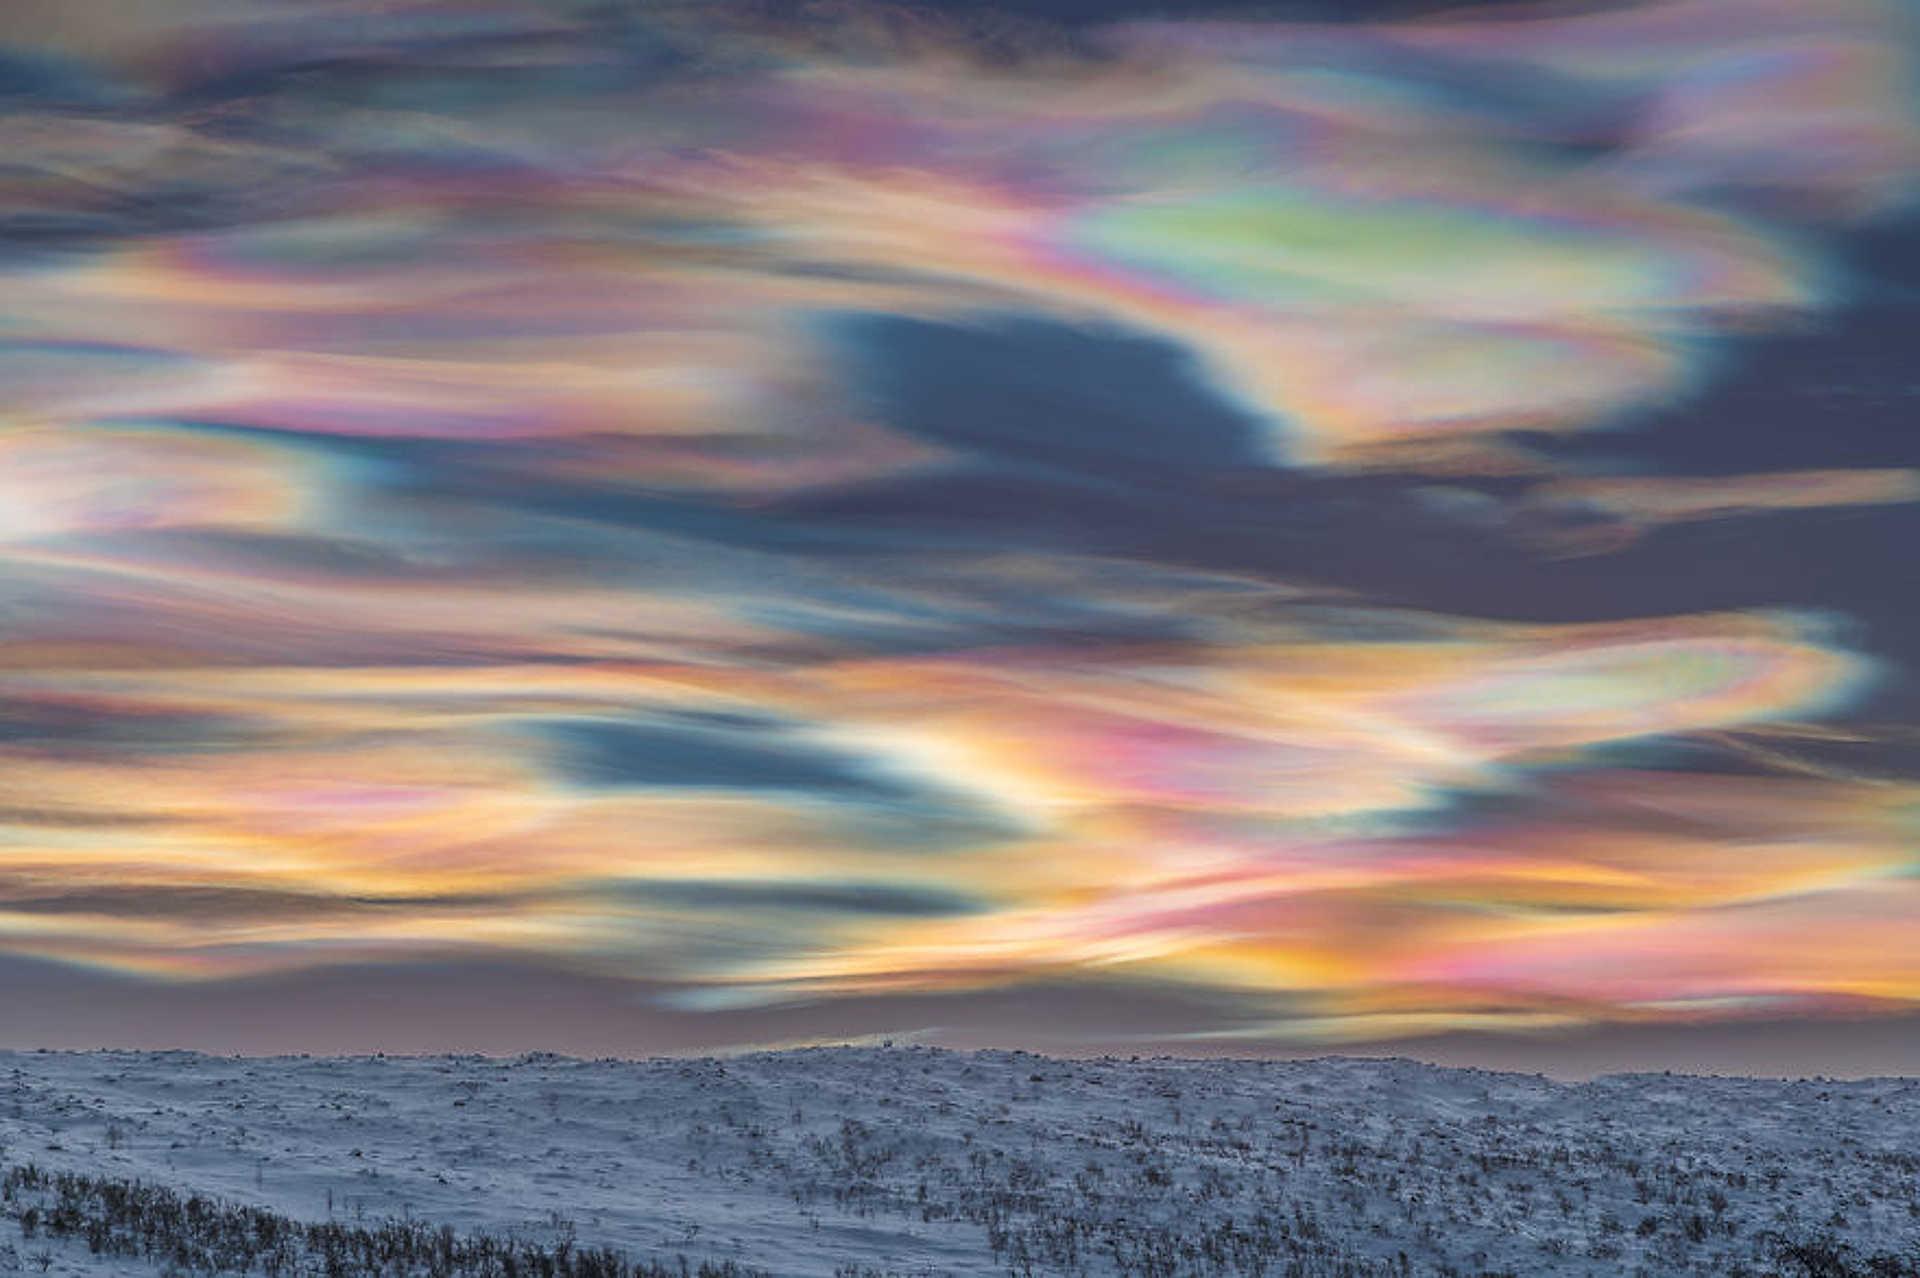 Thomas Kast - Painting the Sky